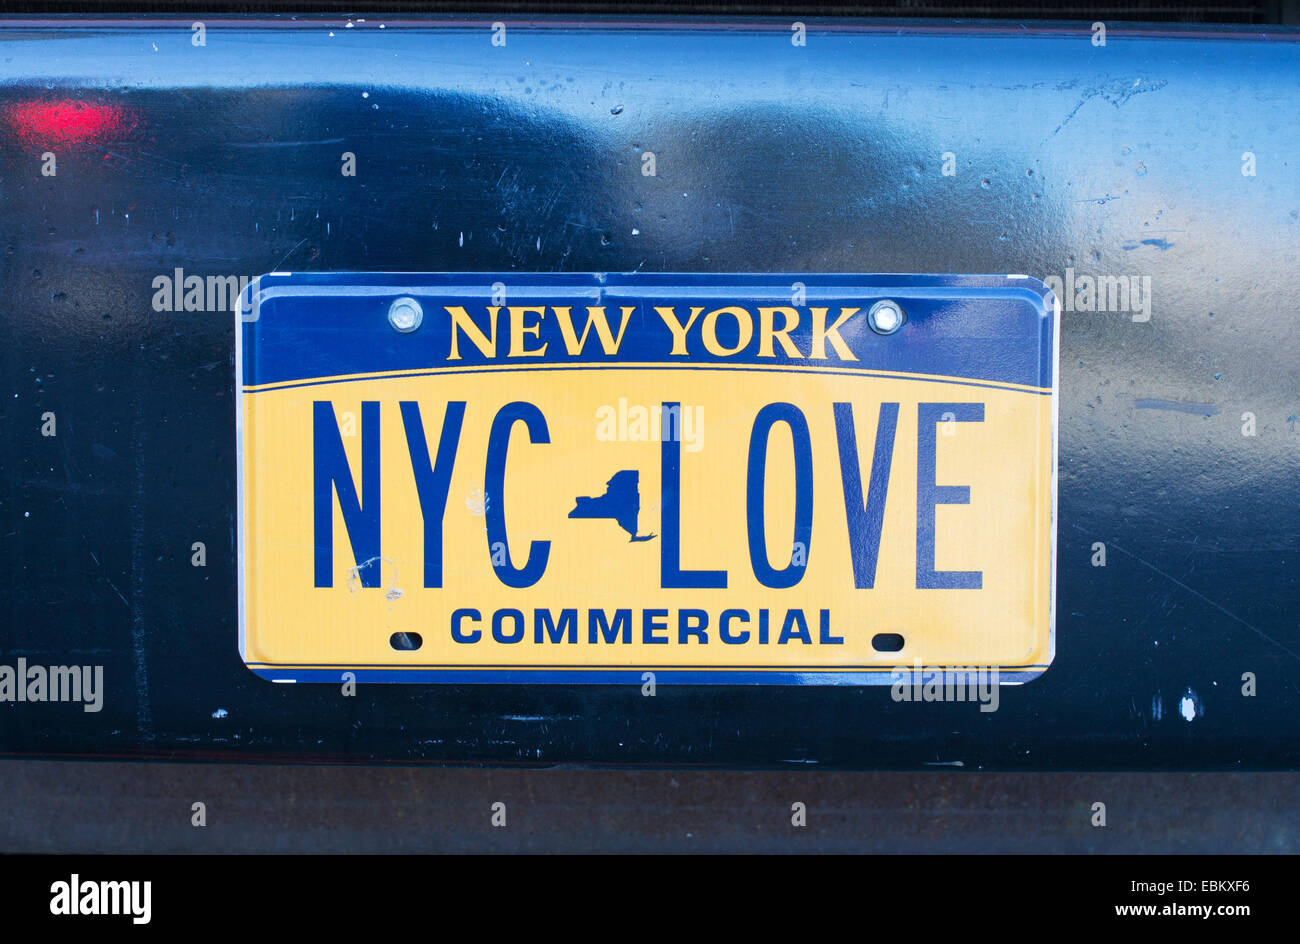 nyc-love-license-plate-seen-in-brooklyn-